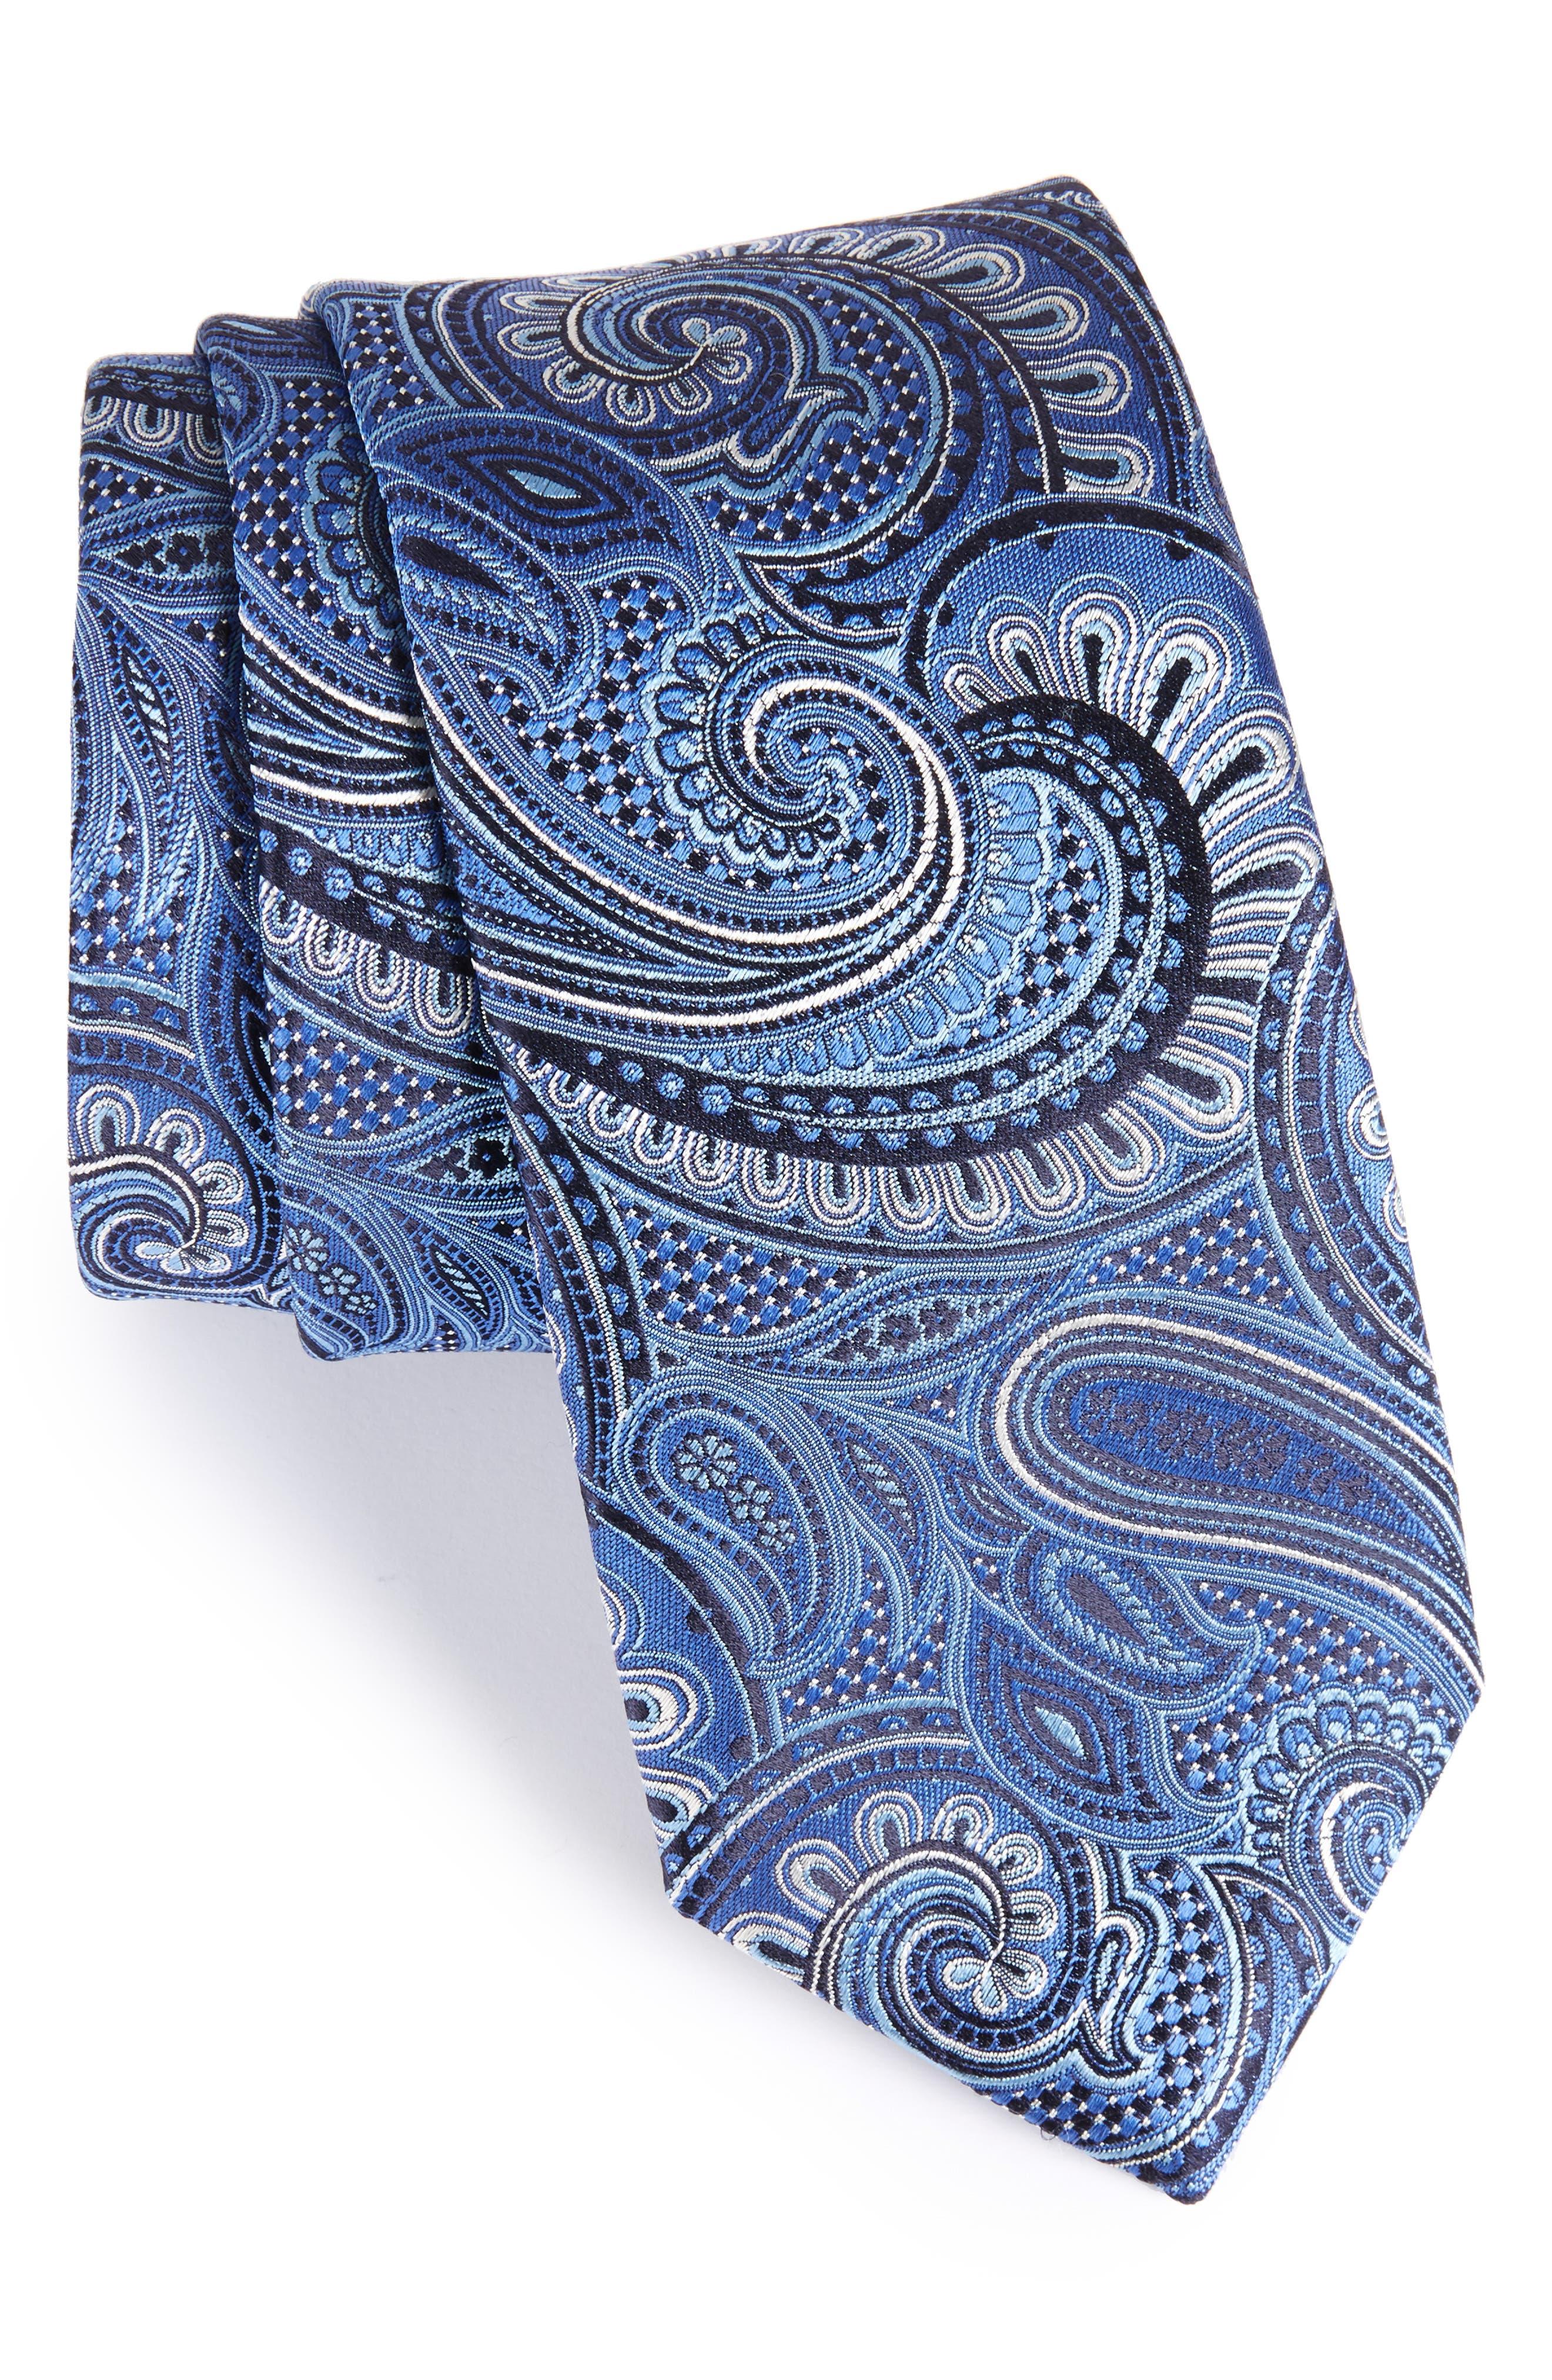 Main Image - John W. Nordstrom Paisley Silk Tie